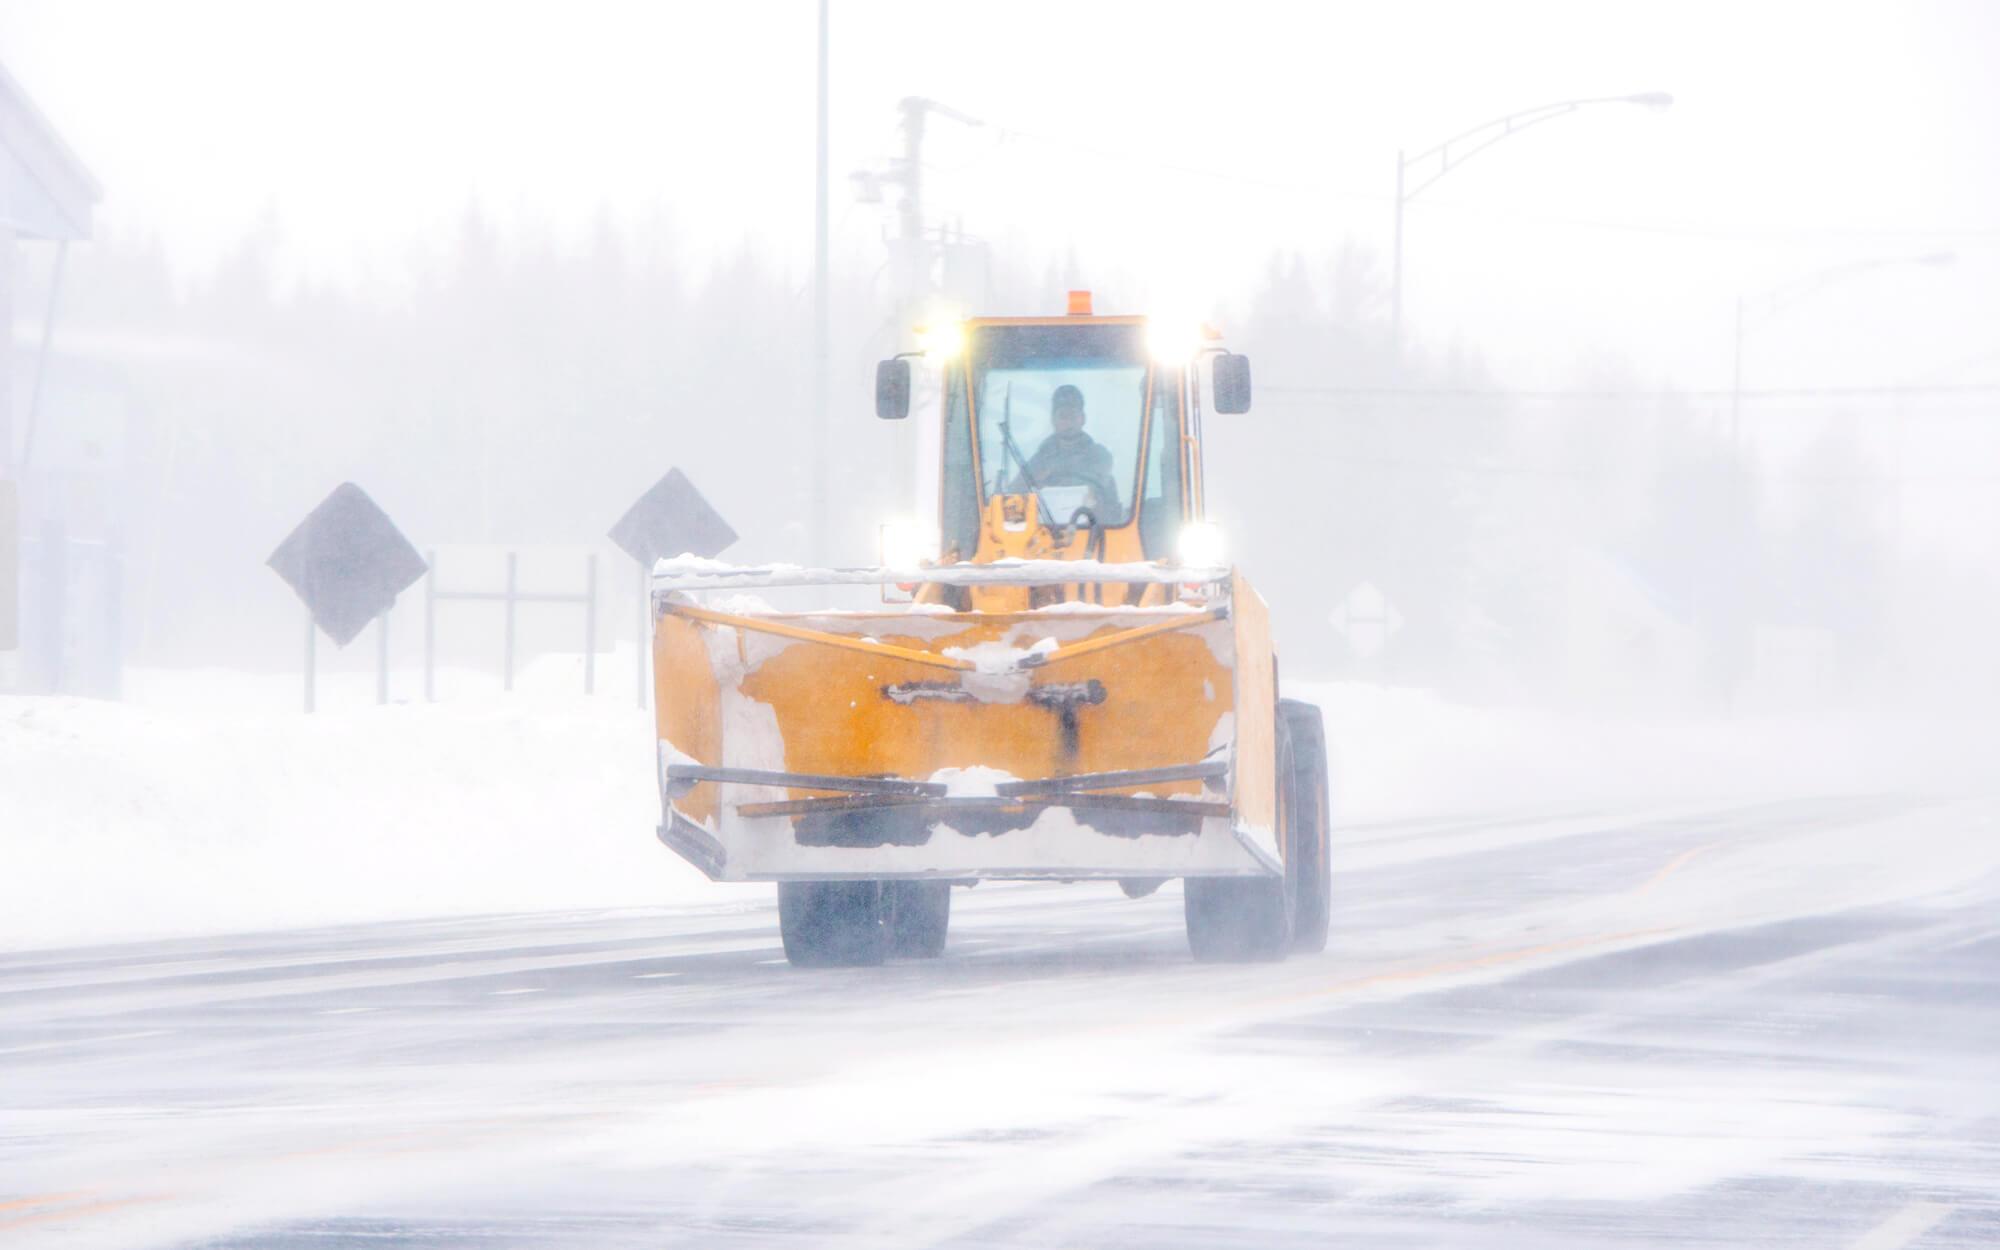 Tempête neige déneigeuse poudrerie Matane